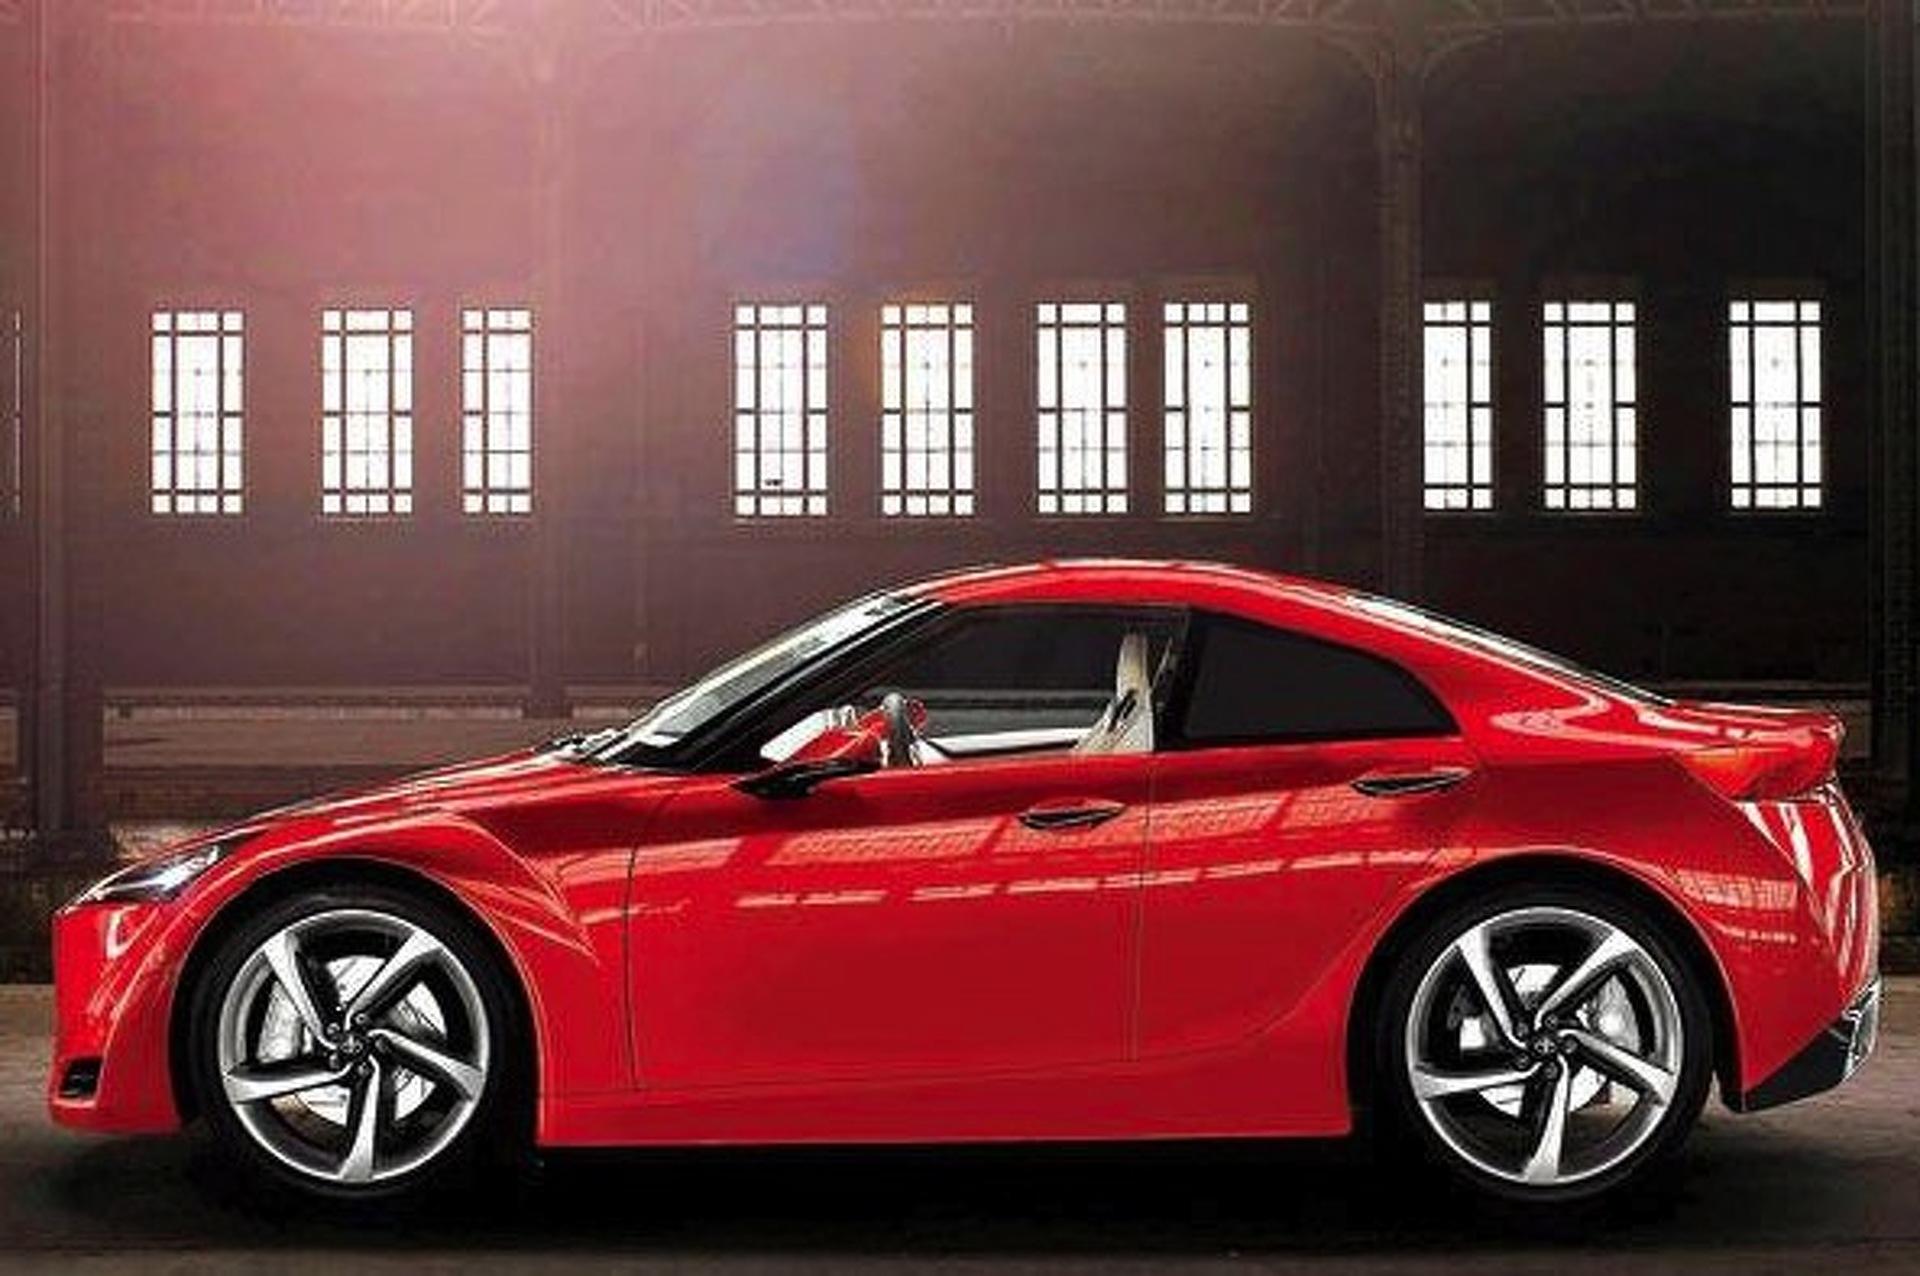 Toyota GT 86 Sedan Debuting This Week in Dubai